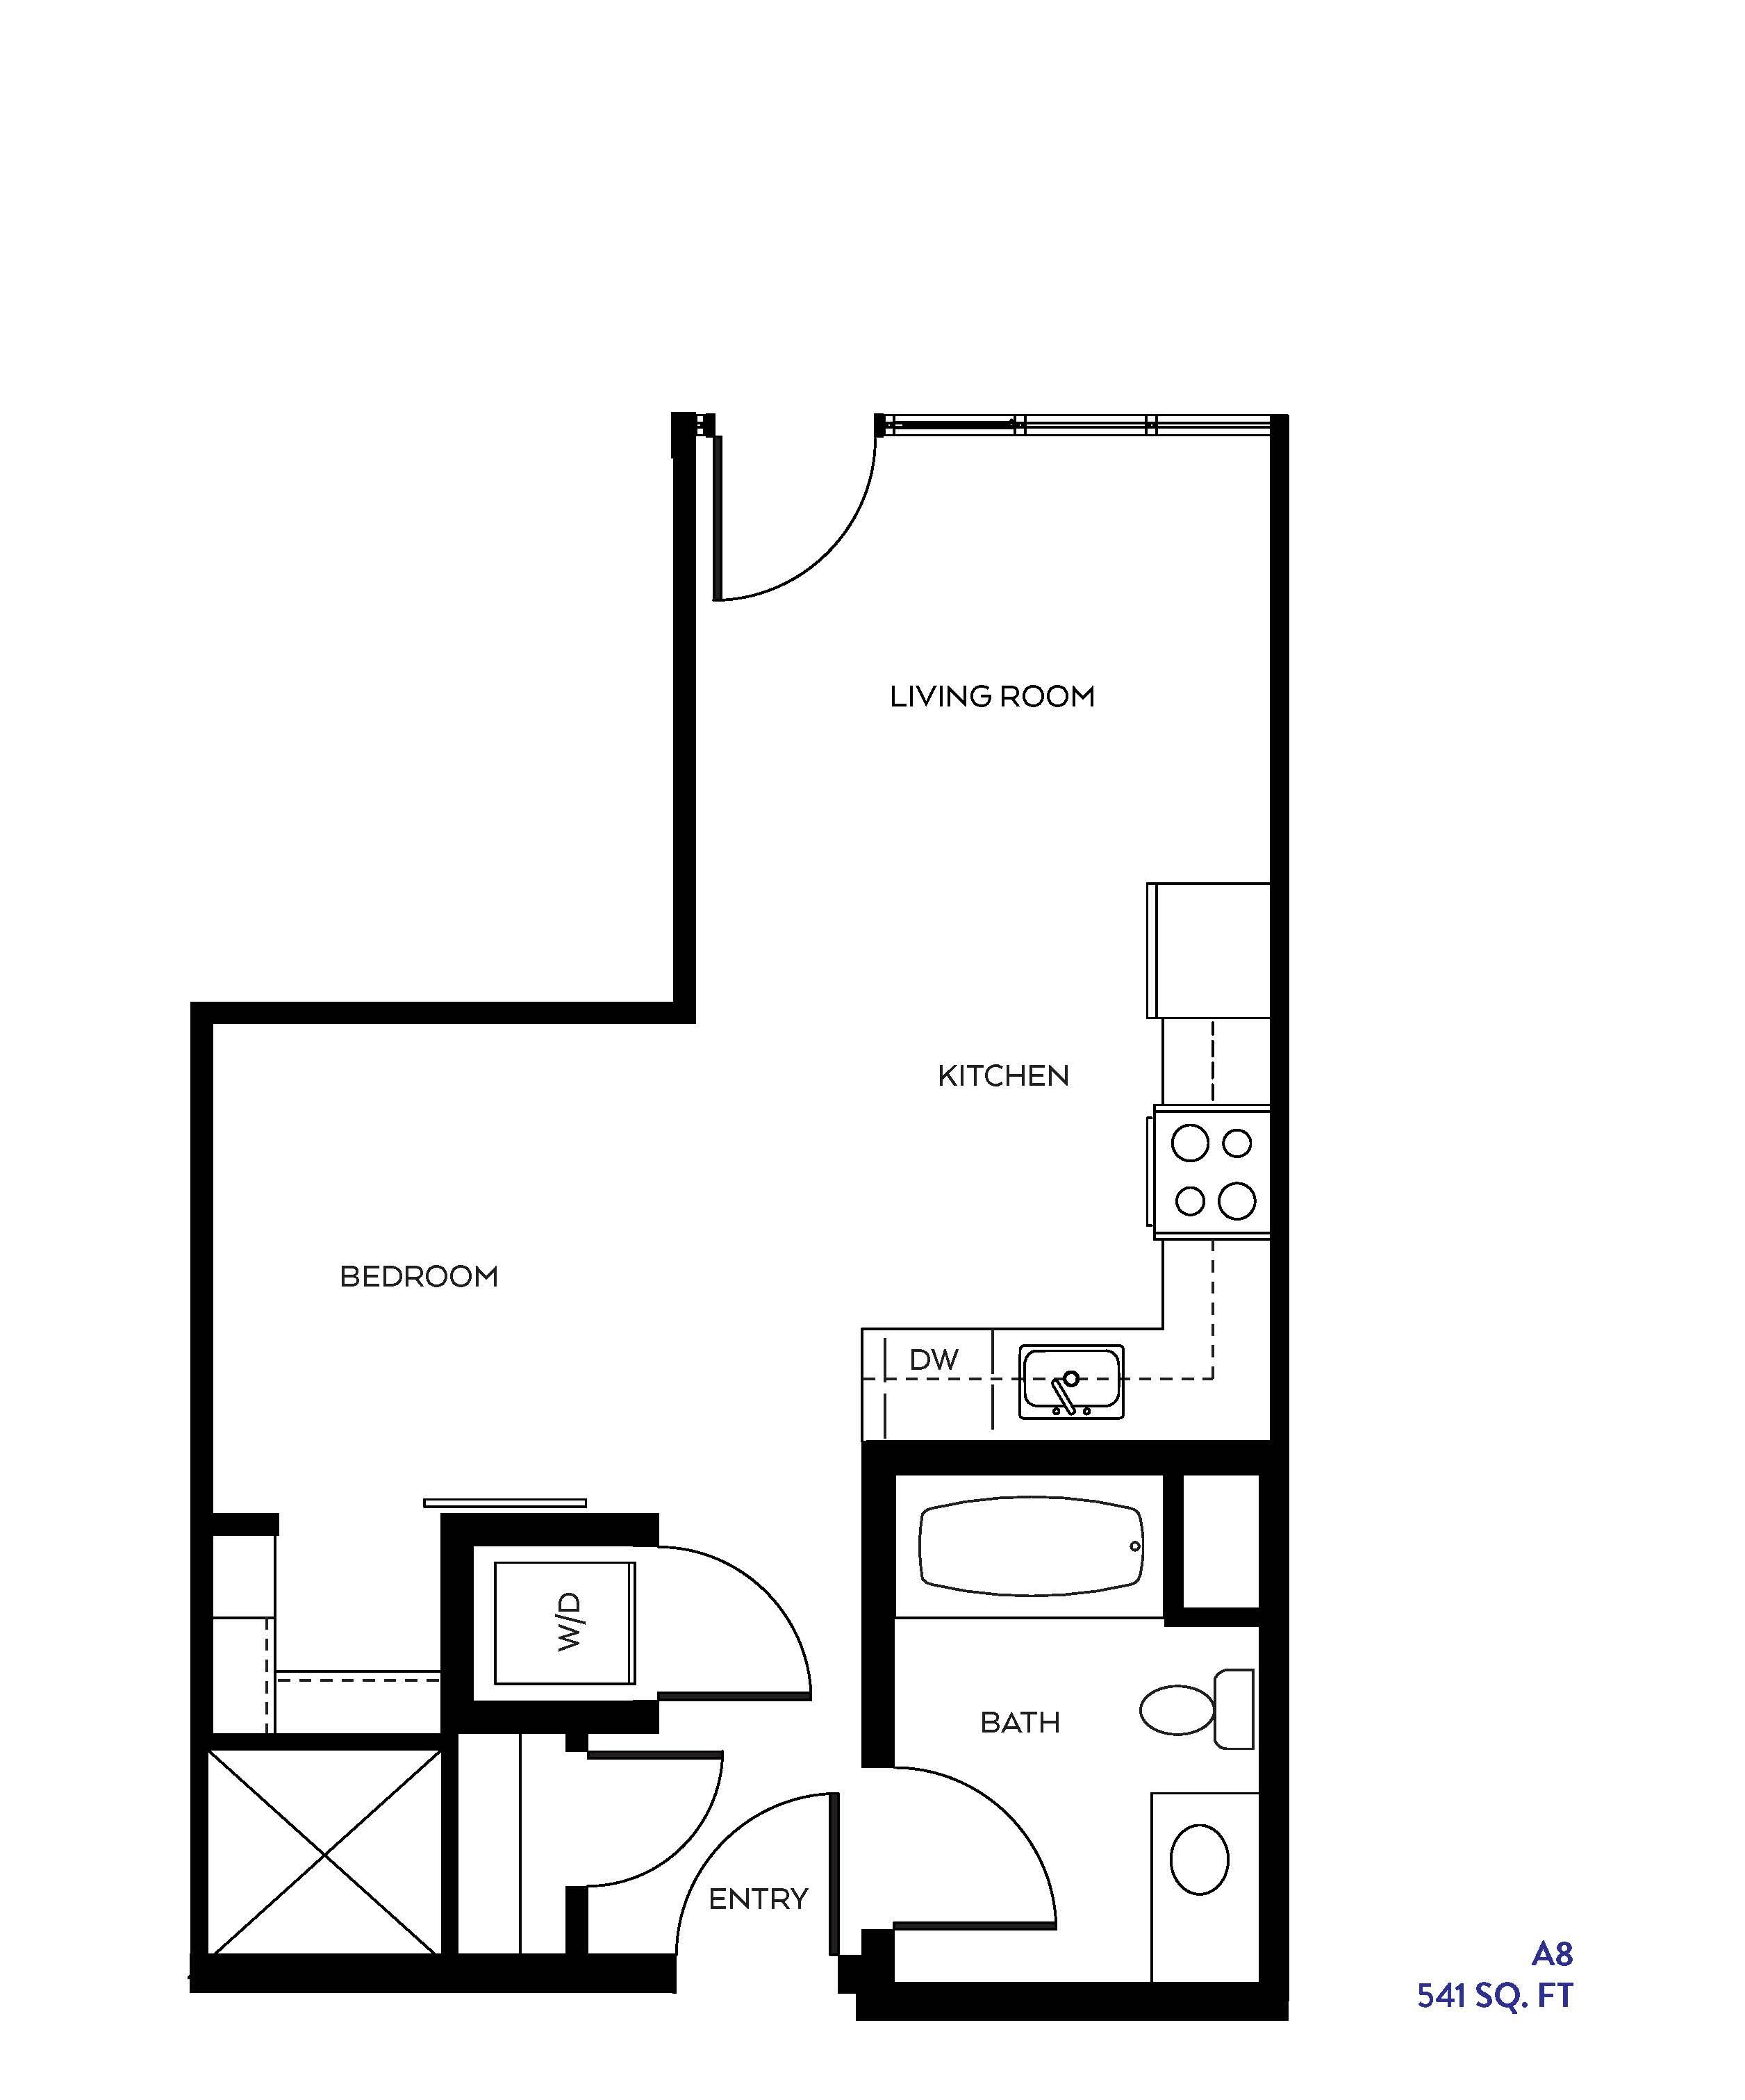 The A8 floor plan